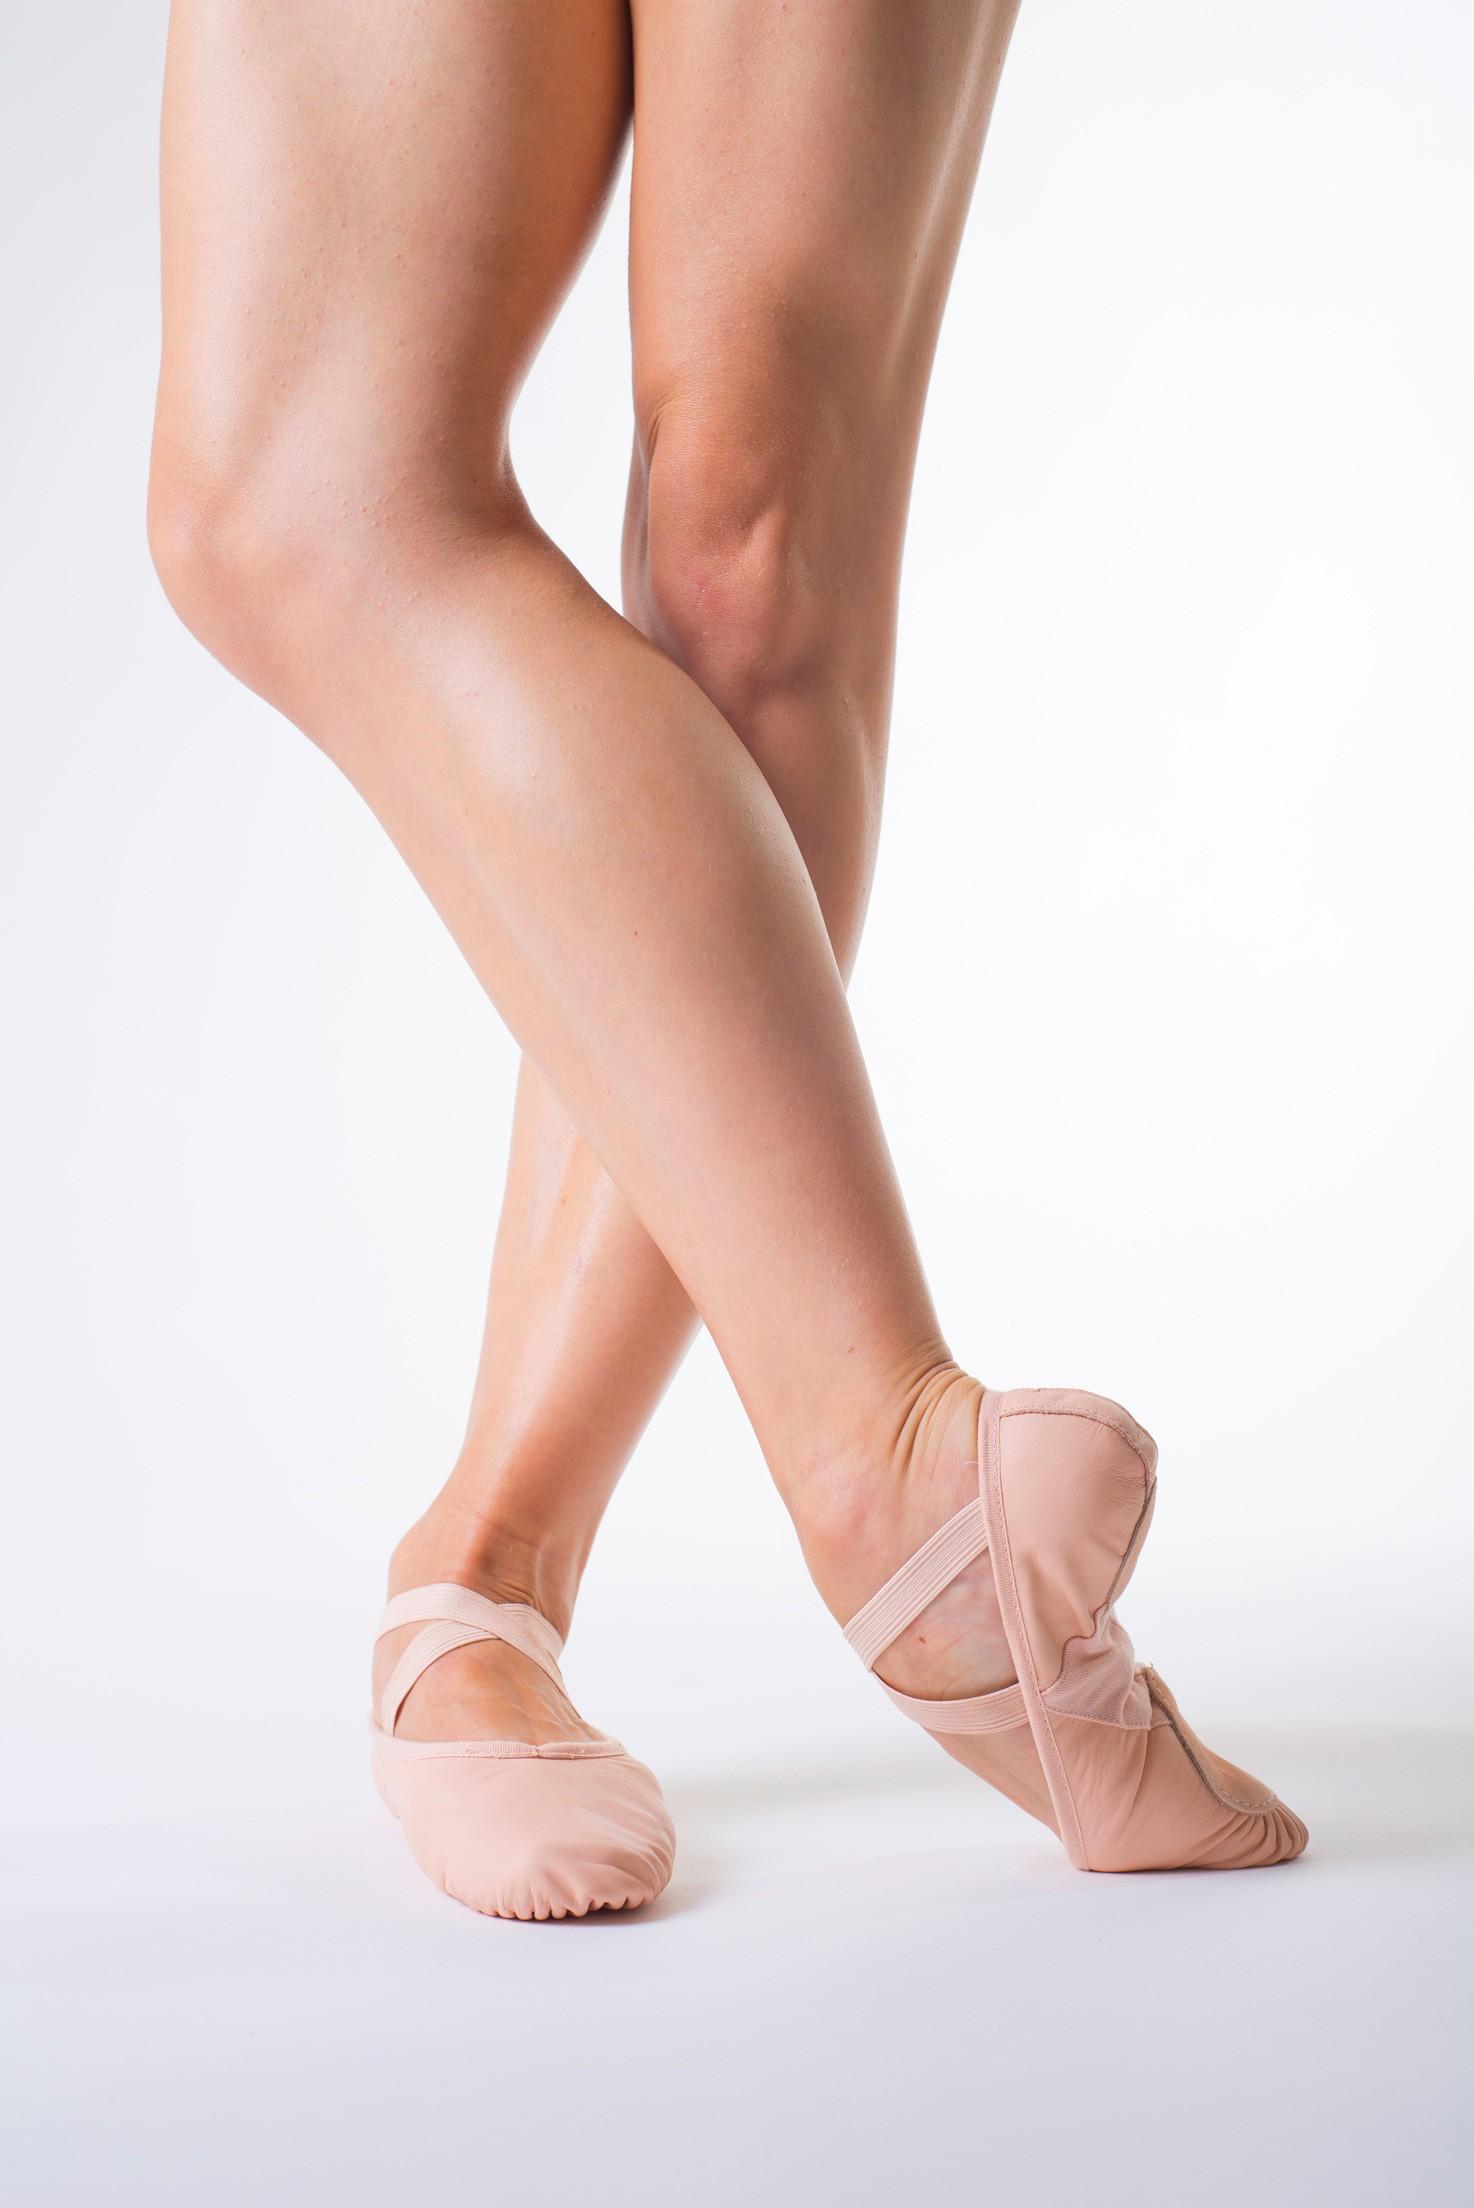 Chausson Danse demi pointes cuir bi-semelle bloch s0203l - mademoiselle danse